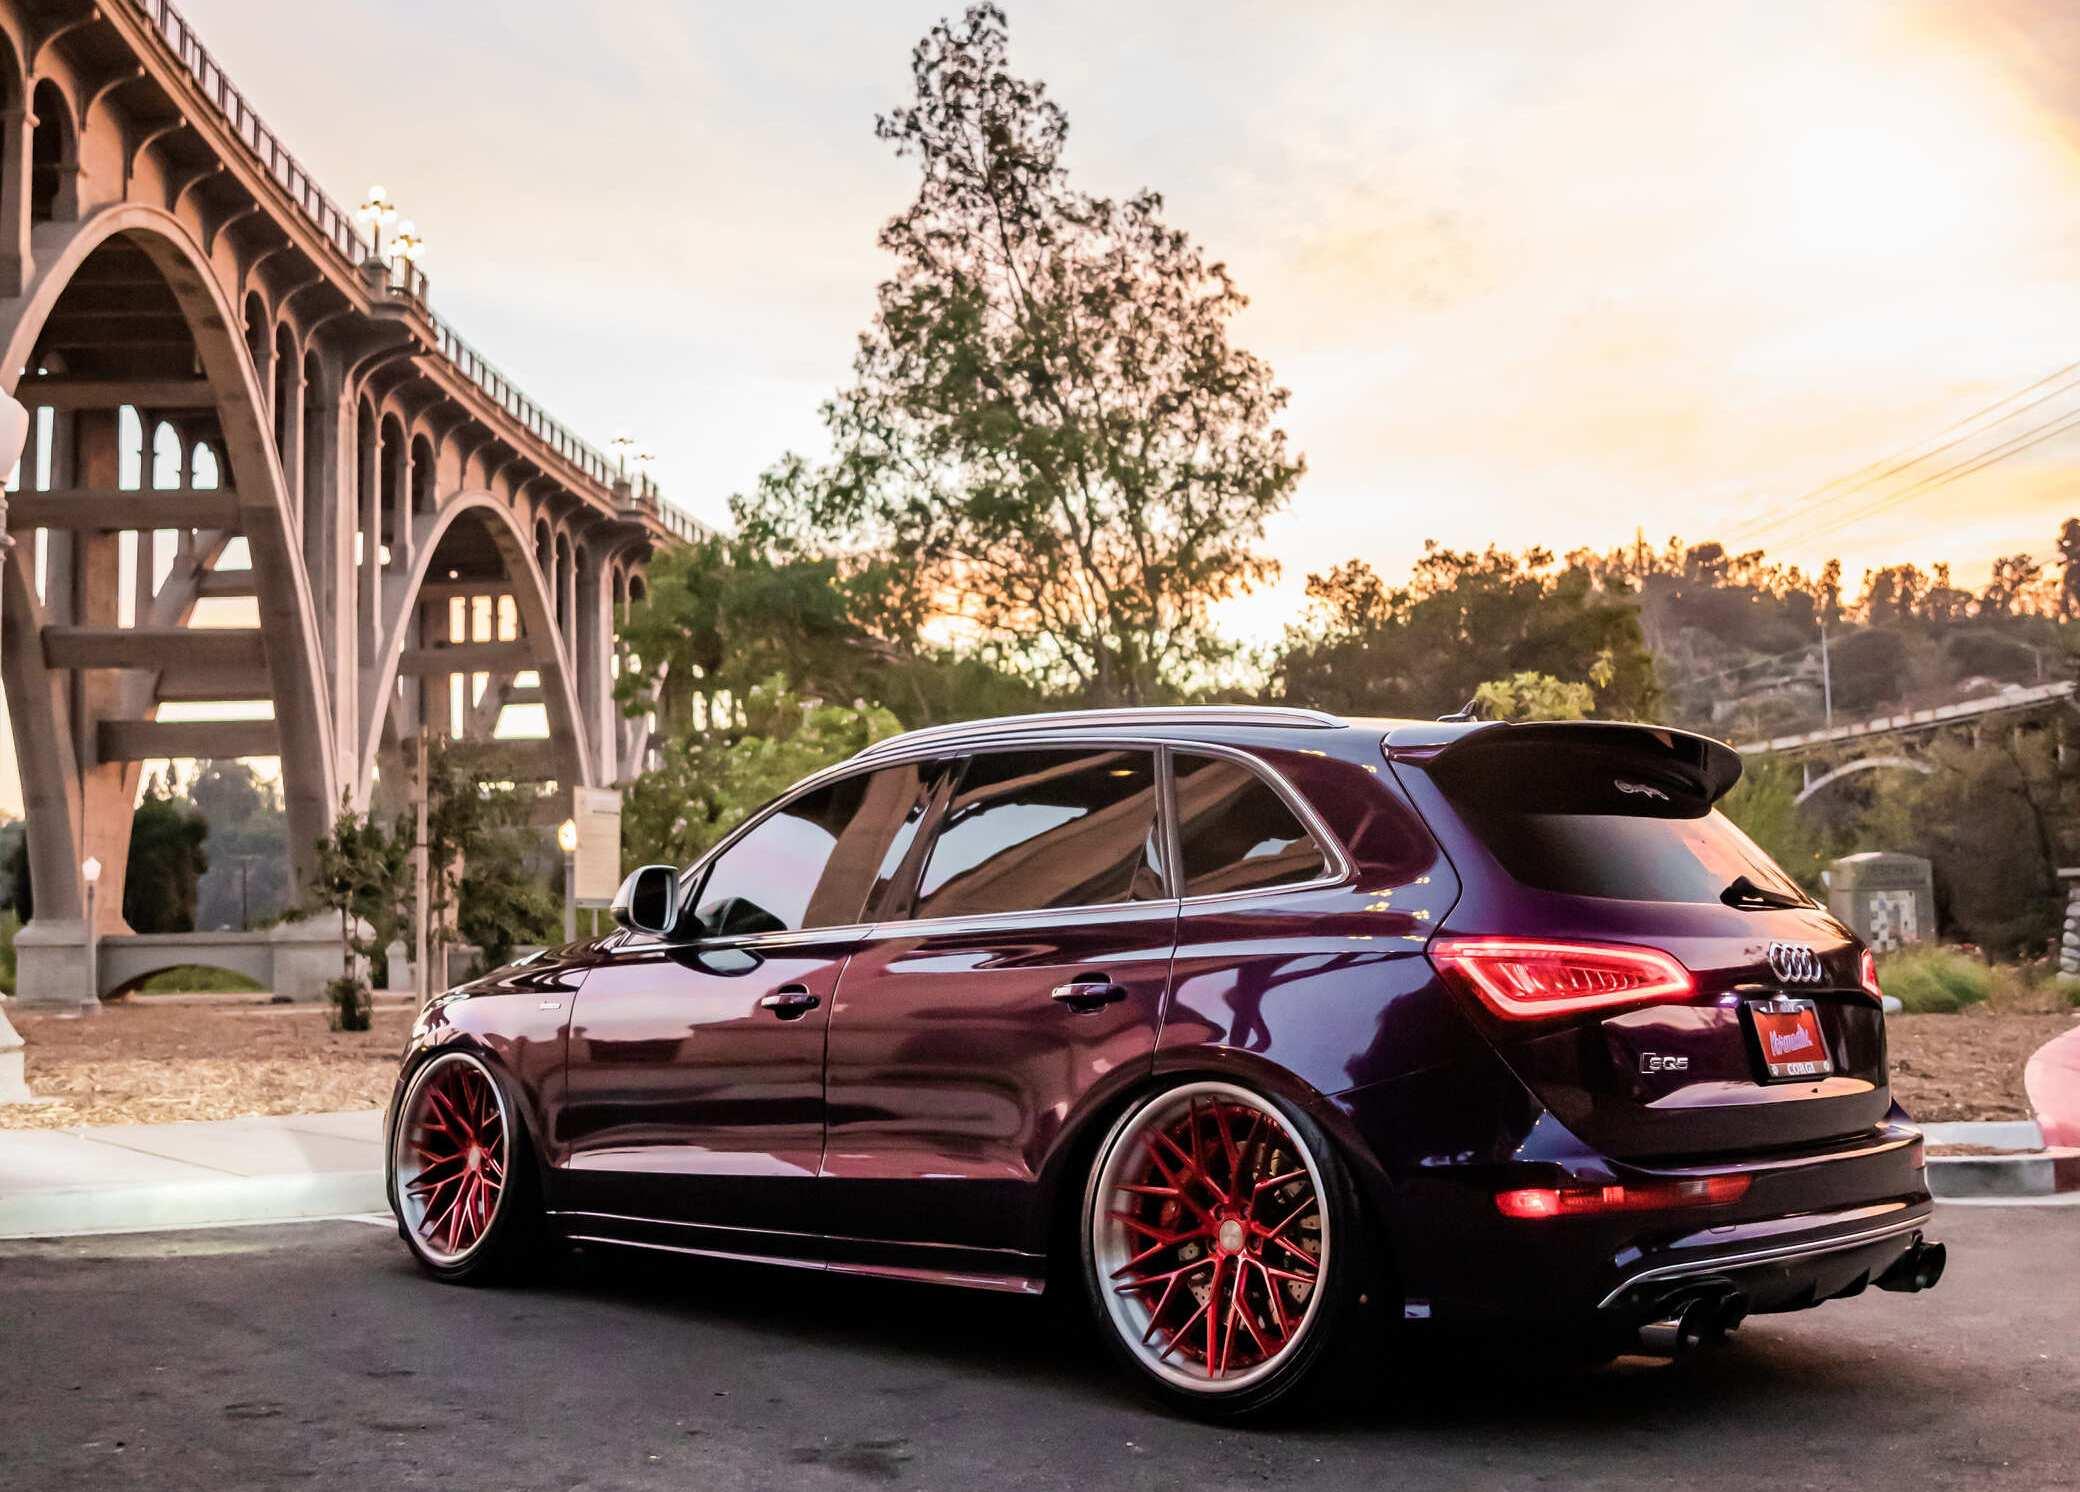 Bagged Audi SQ5